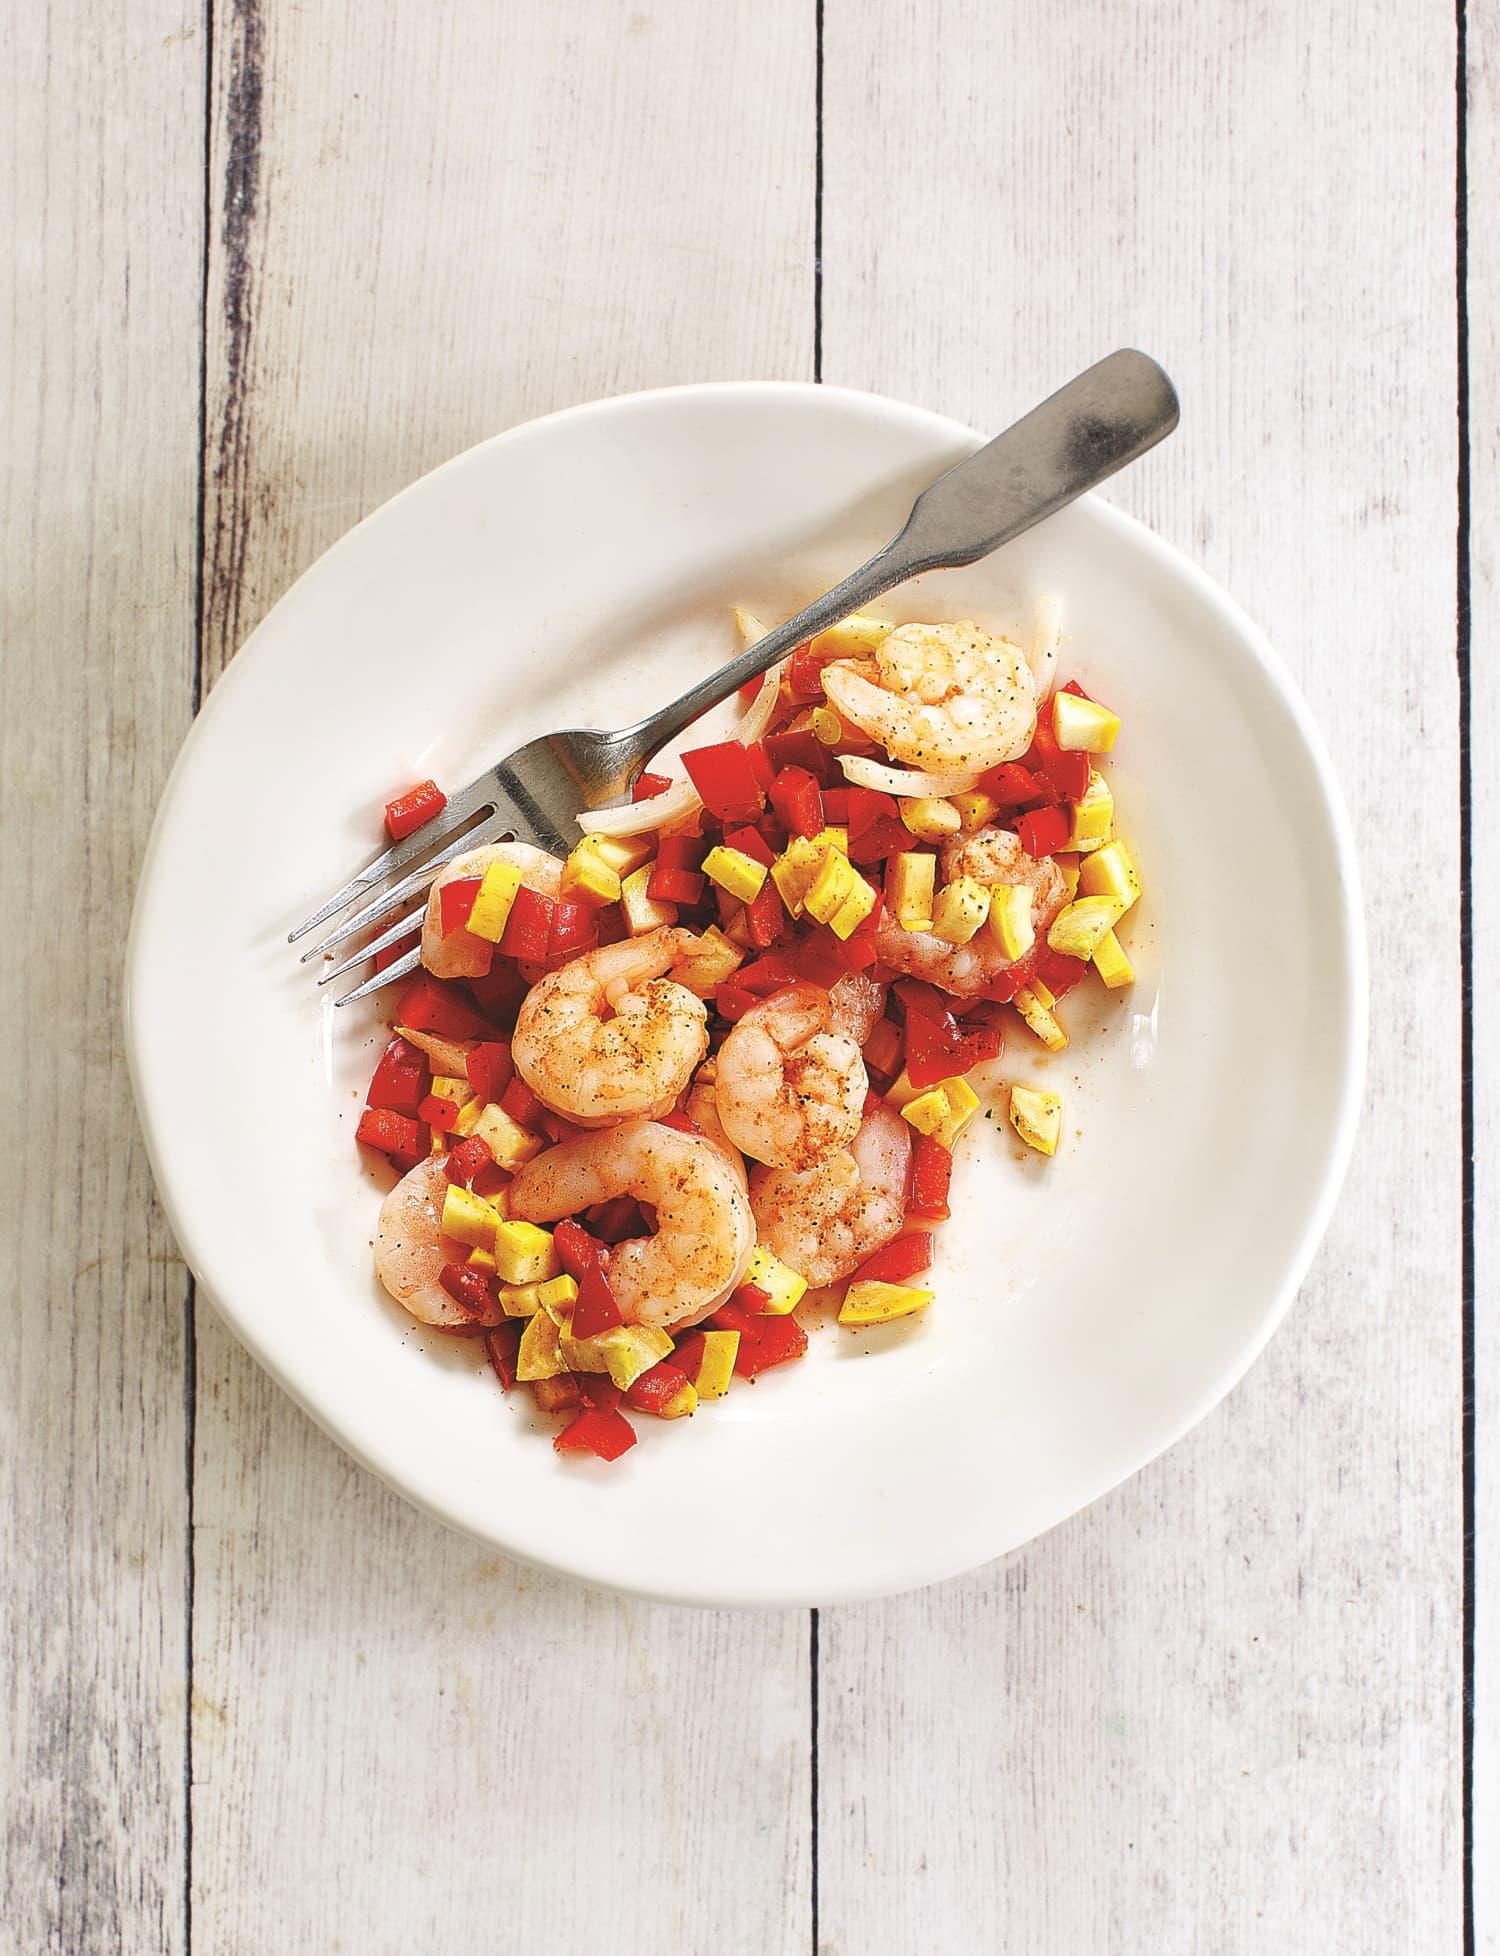 No-Mess Cajun Shrimp Foil Packs Are the Perfect Single-Serve Dinner